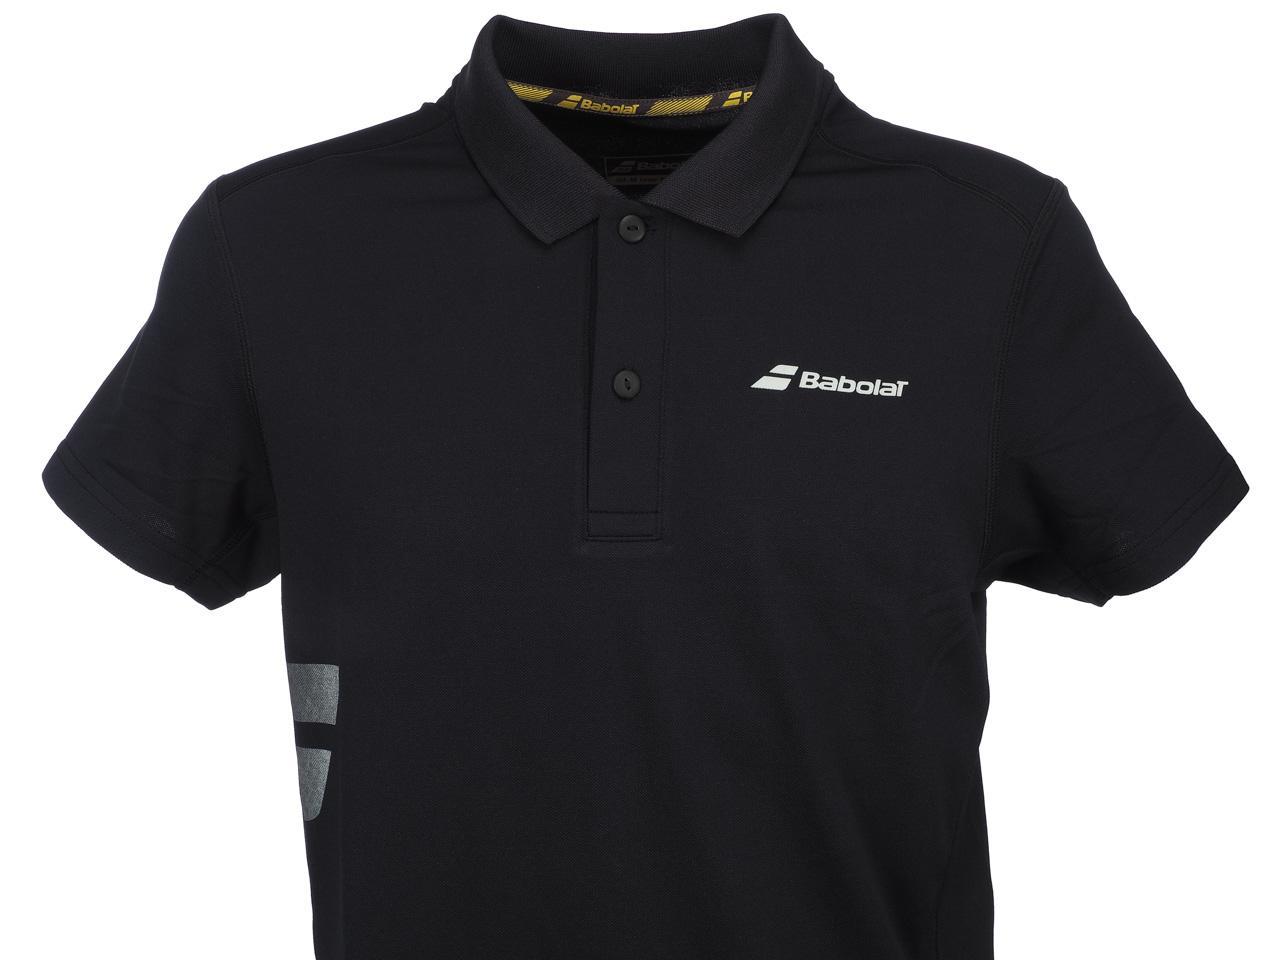 Polo-Tennis-Babolat-Polo-Core-Club-Black-Black-70103-New thumbnail 2